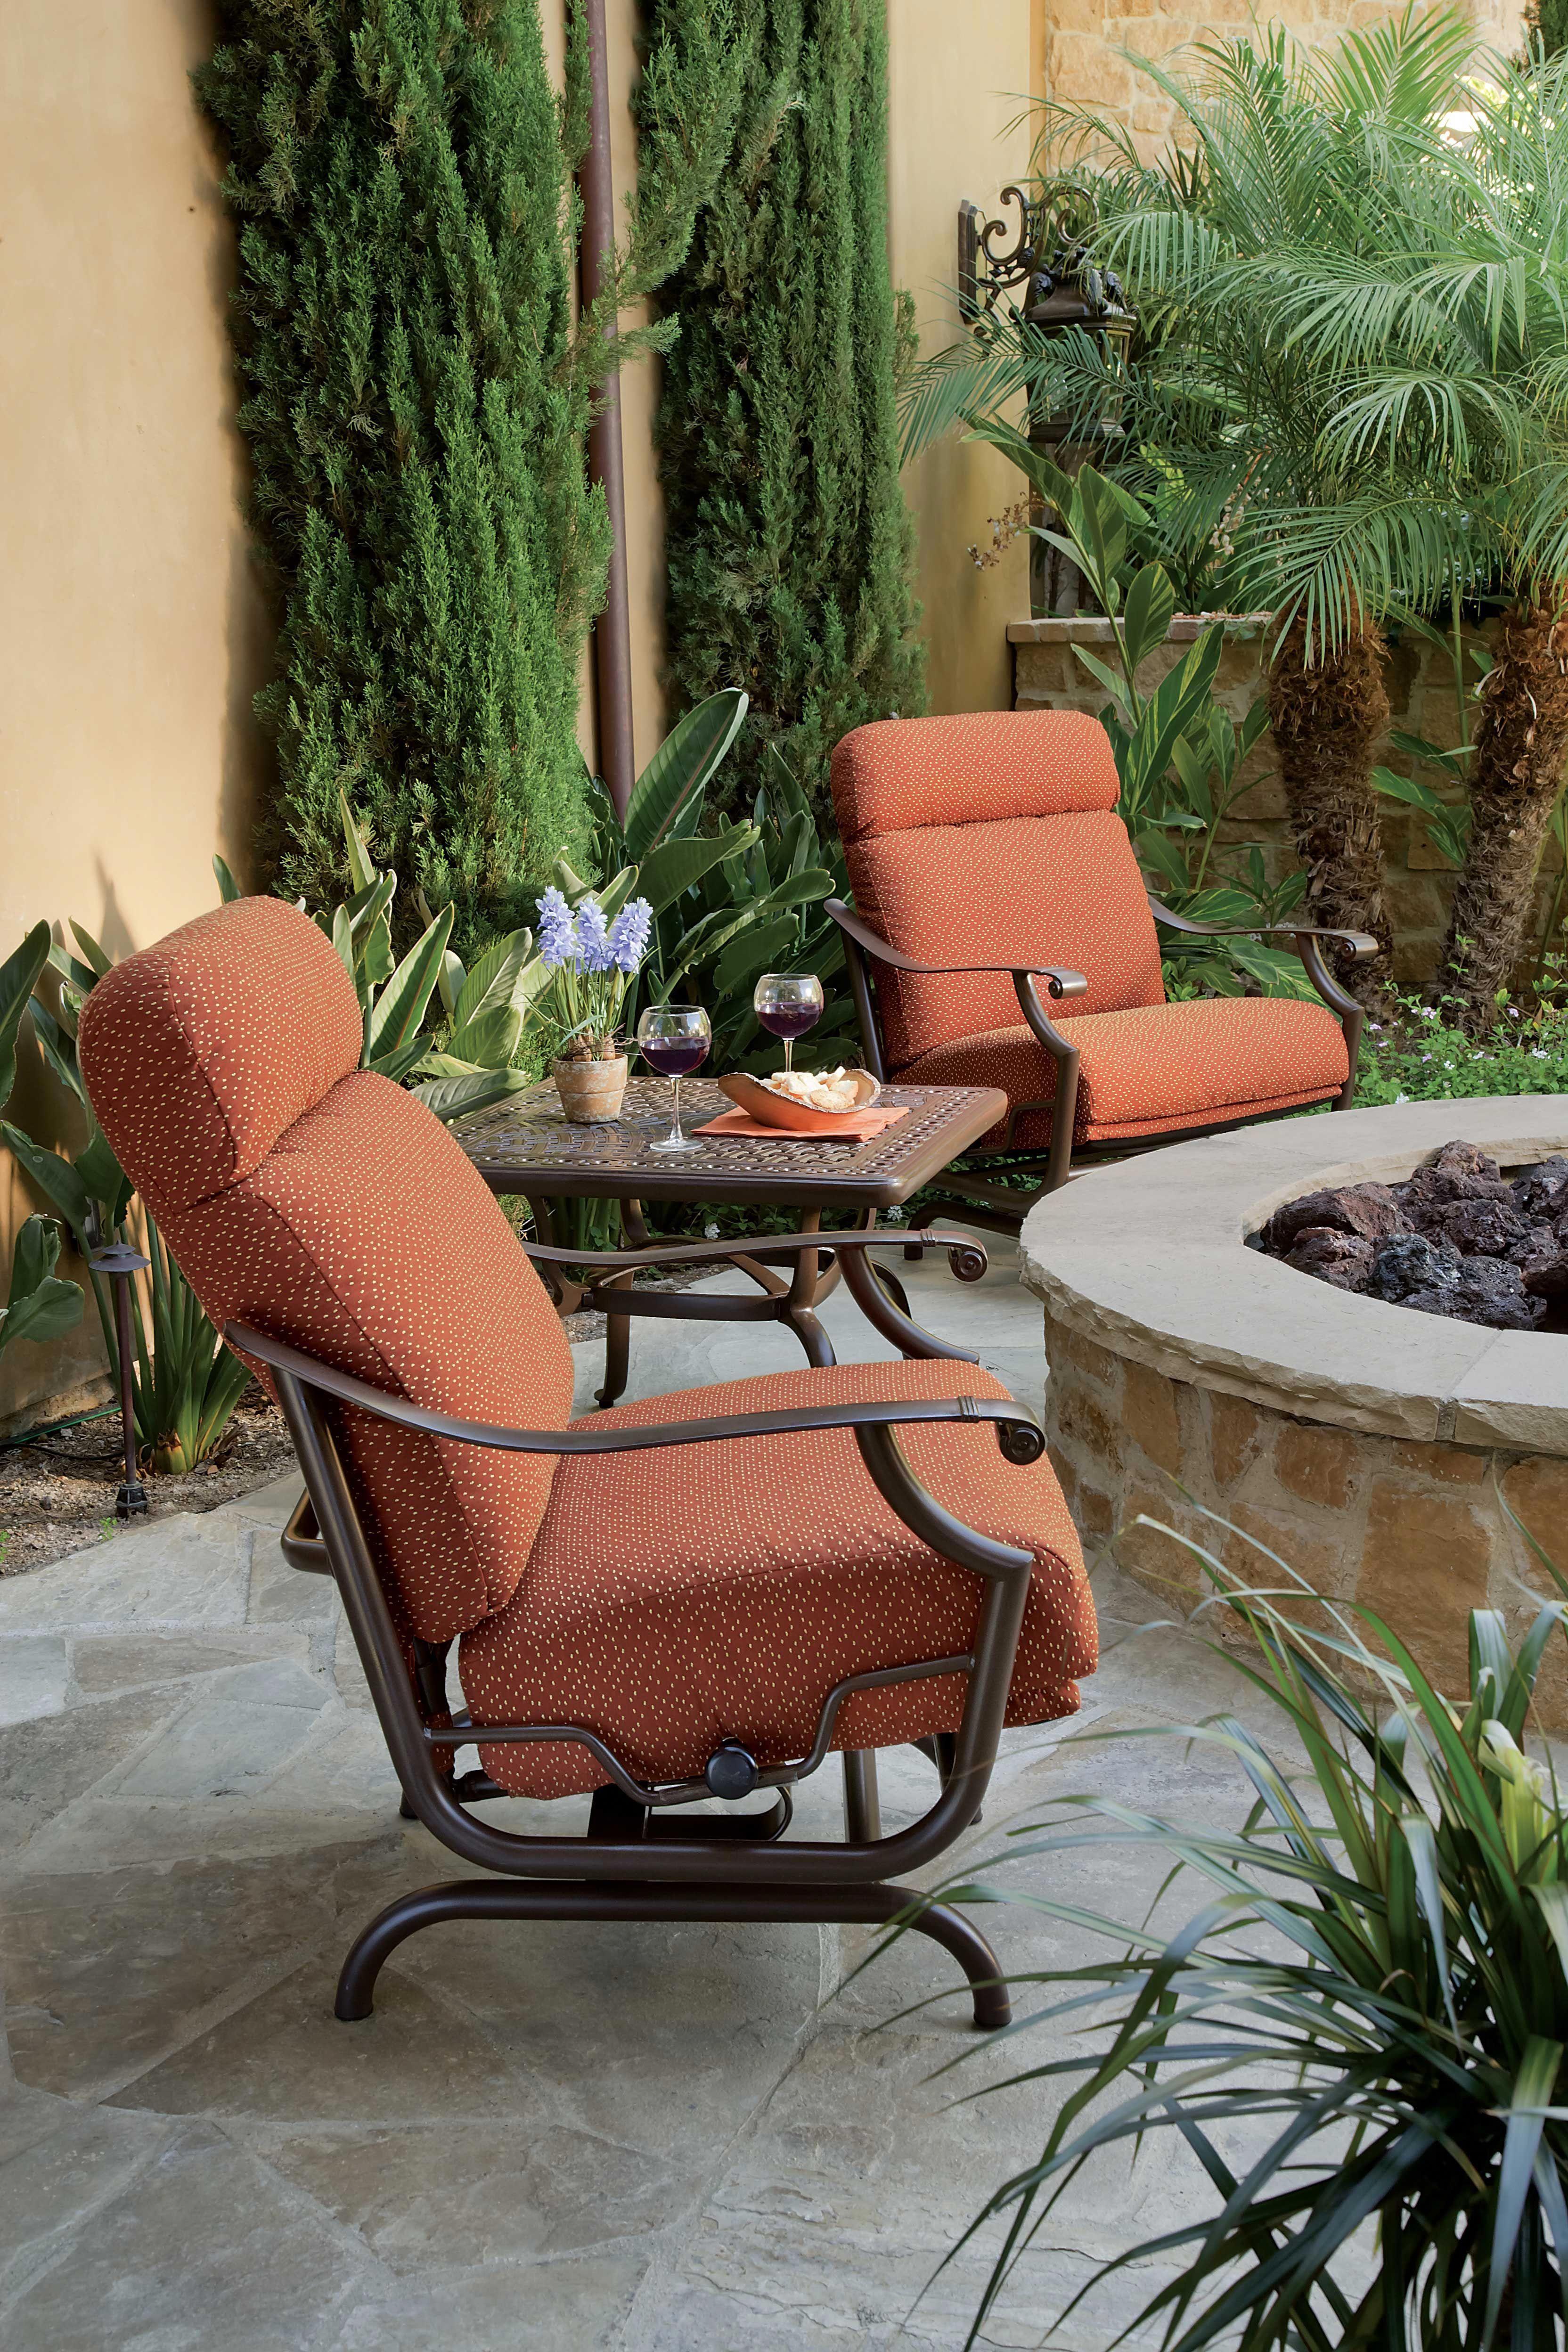 Montreux Cushion Action Lounger By Tropitone Patiofurnitureideas